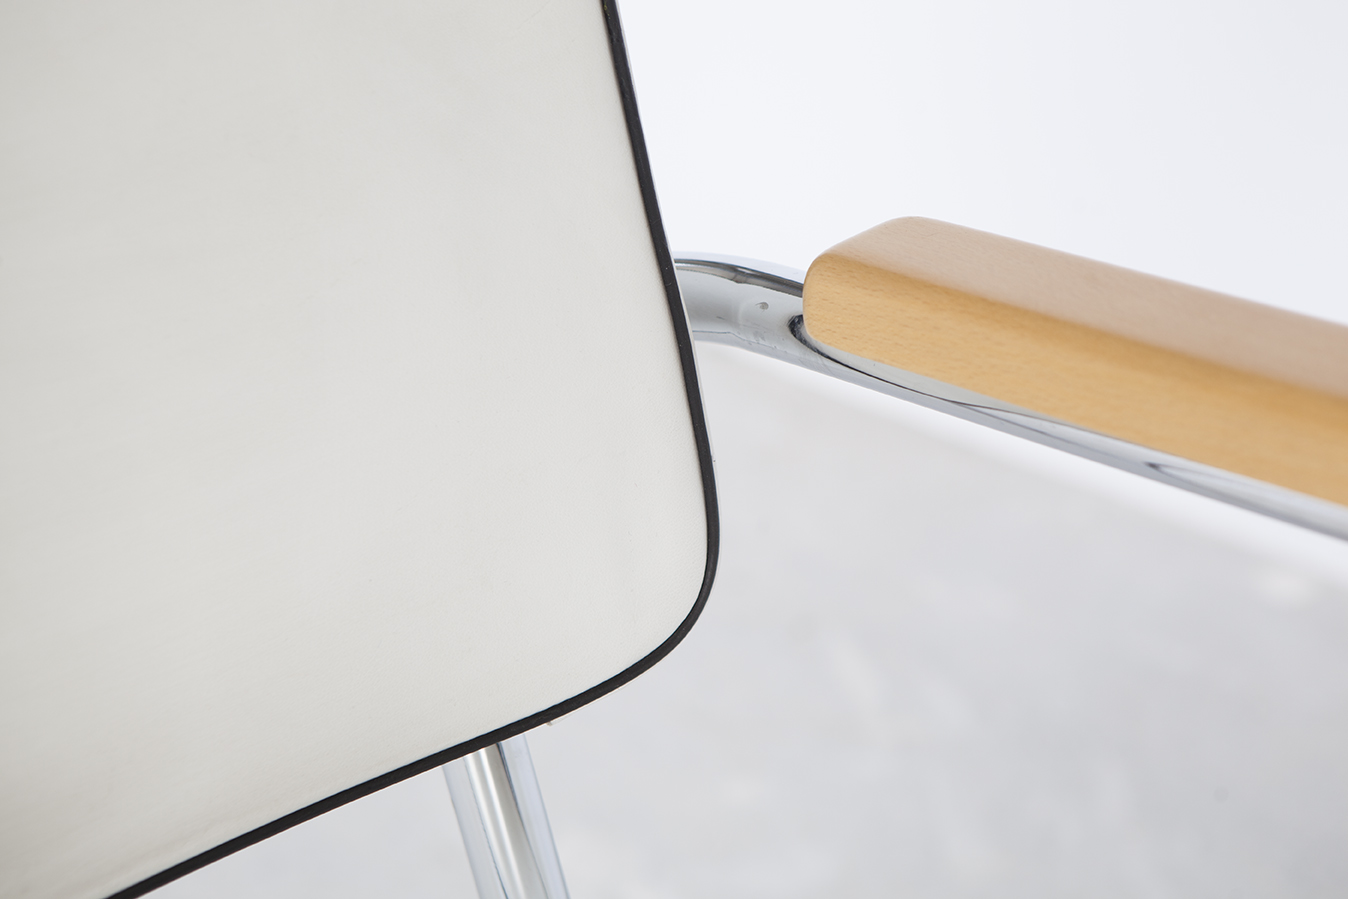 detalle piel macera silla de acero bauhaus diseño